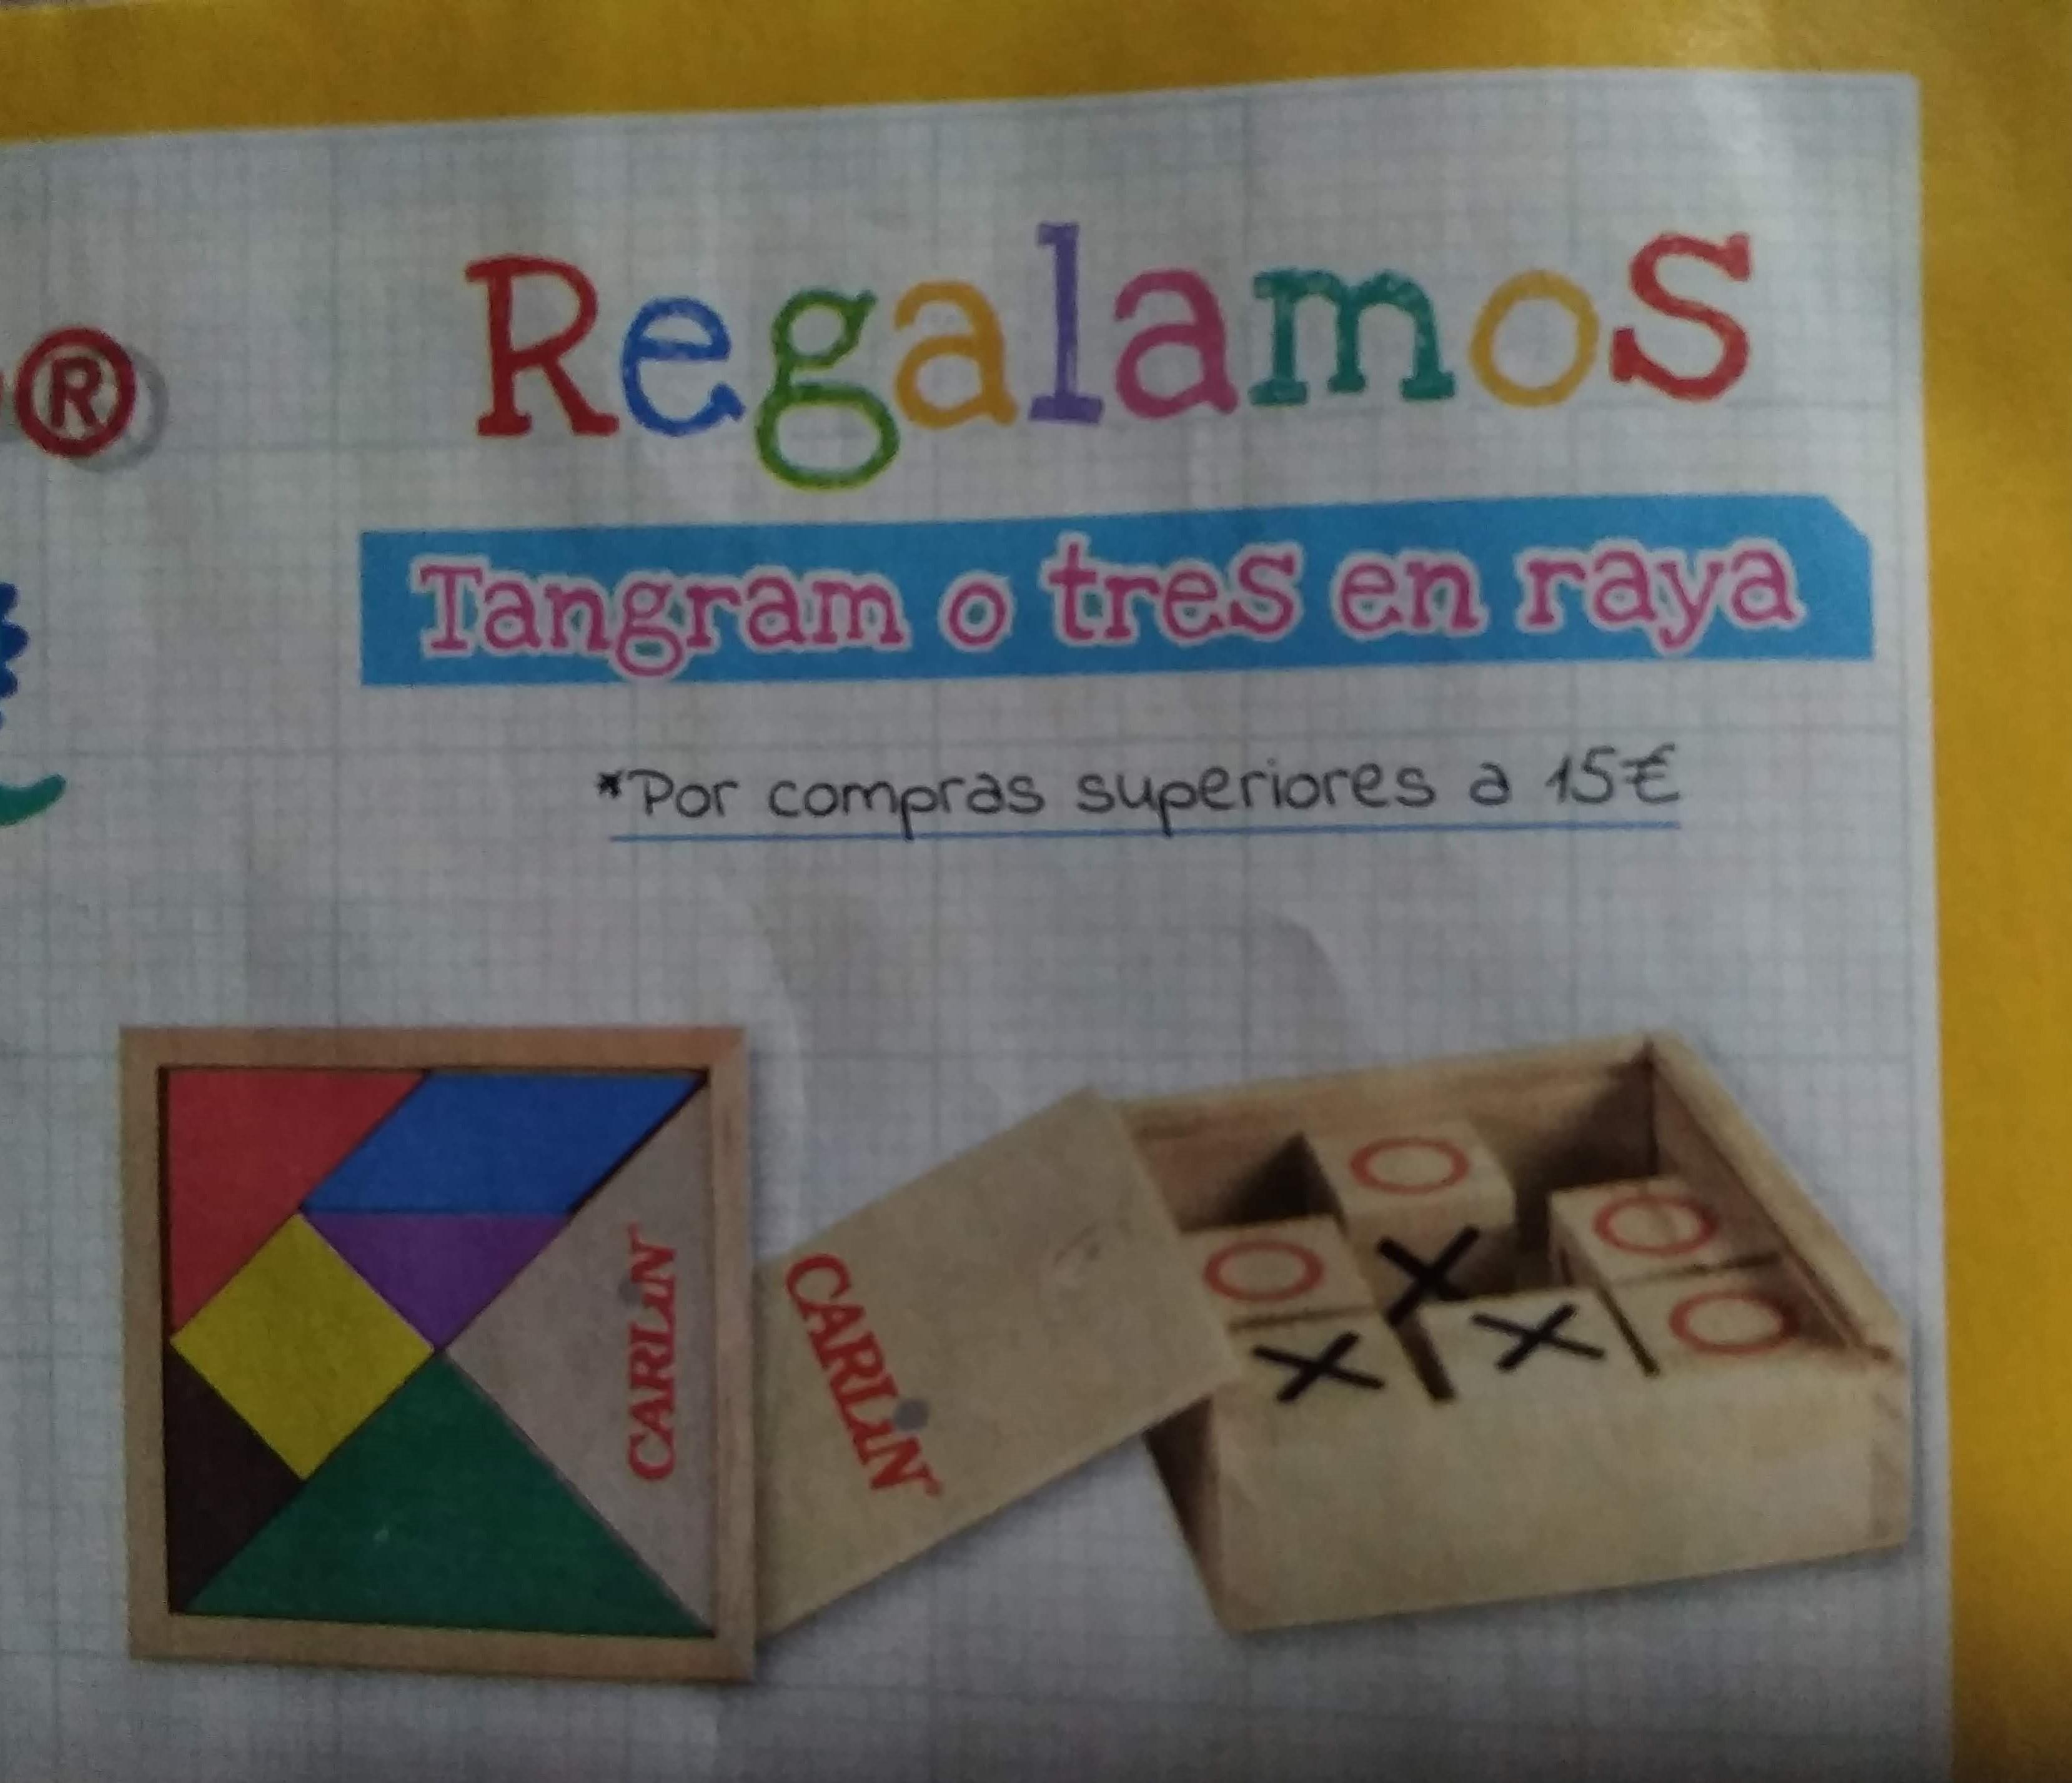 2x1 en cinta Tipp-Ex + Tangram o tres en raya de regalo por compras superiores a 15€ en Carlin [material escolar y de oficina]